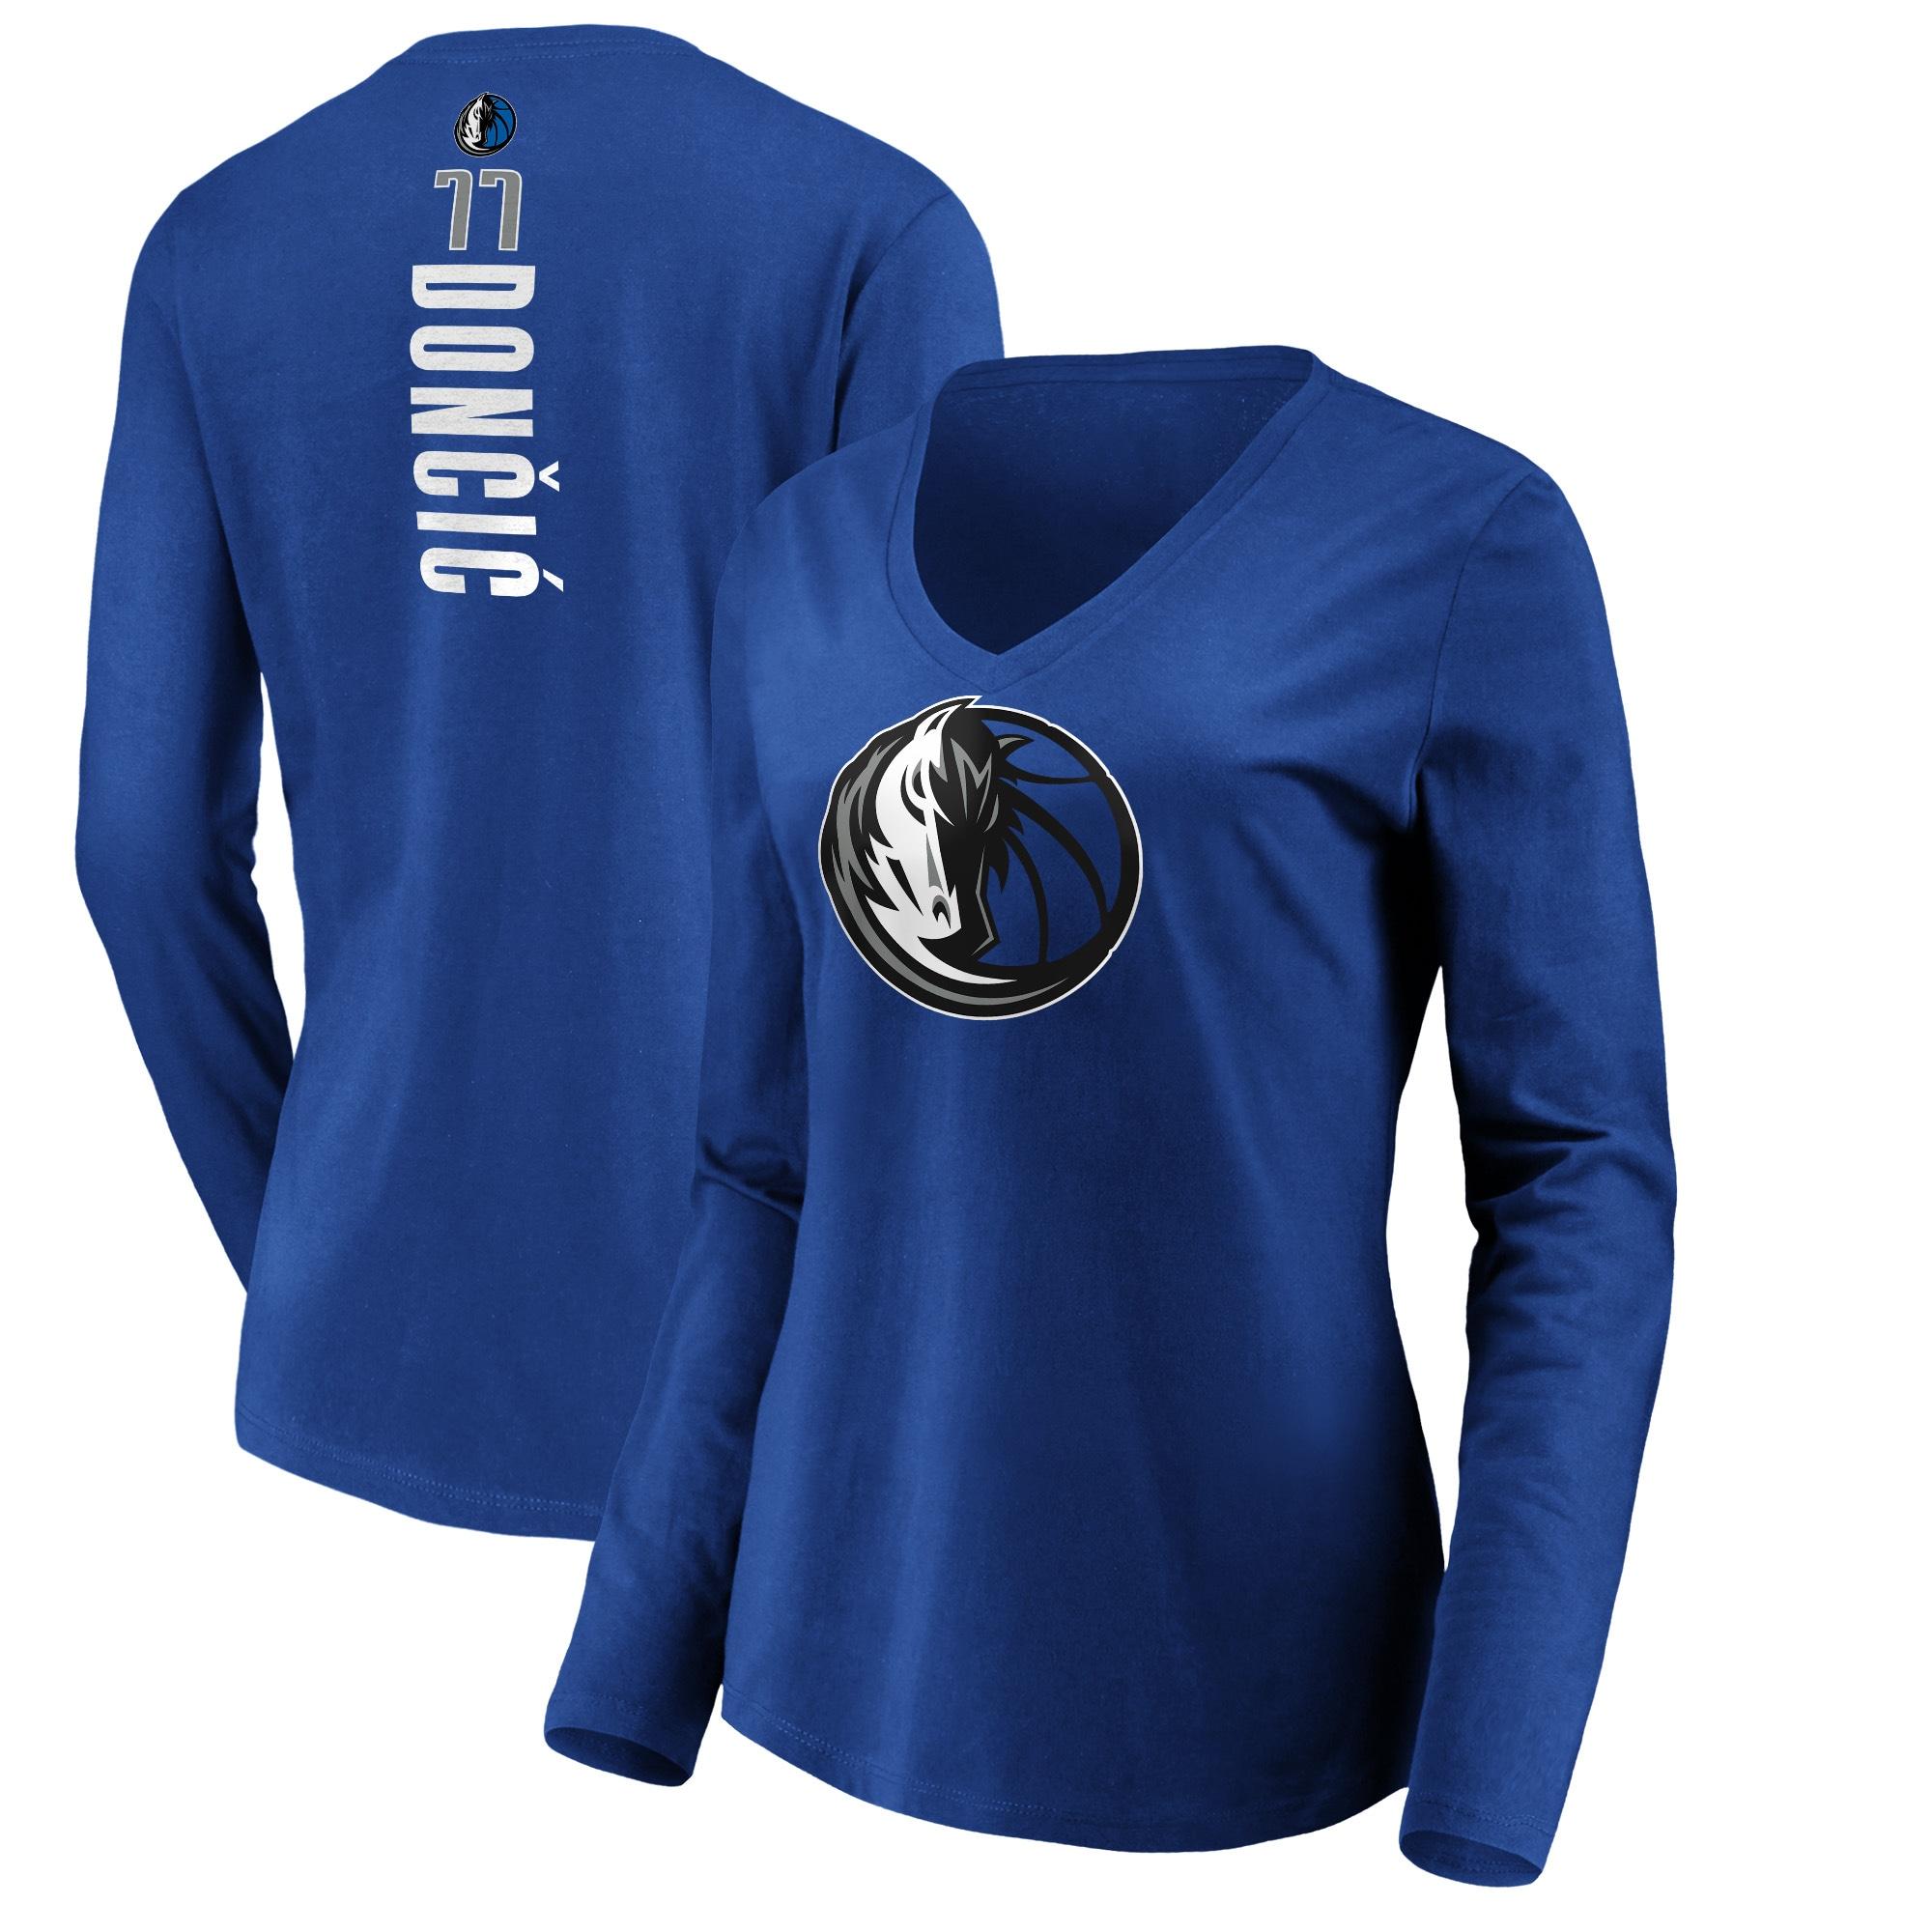 Luka Doncic Dallas Mavericks Fanatics Branded Women's Playmaker Name & Number Long Sleeve V-Neck T-Shirt - Royal